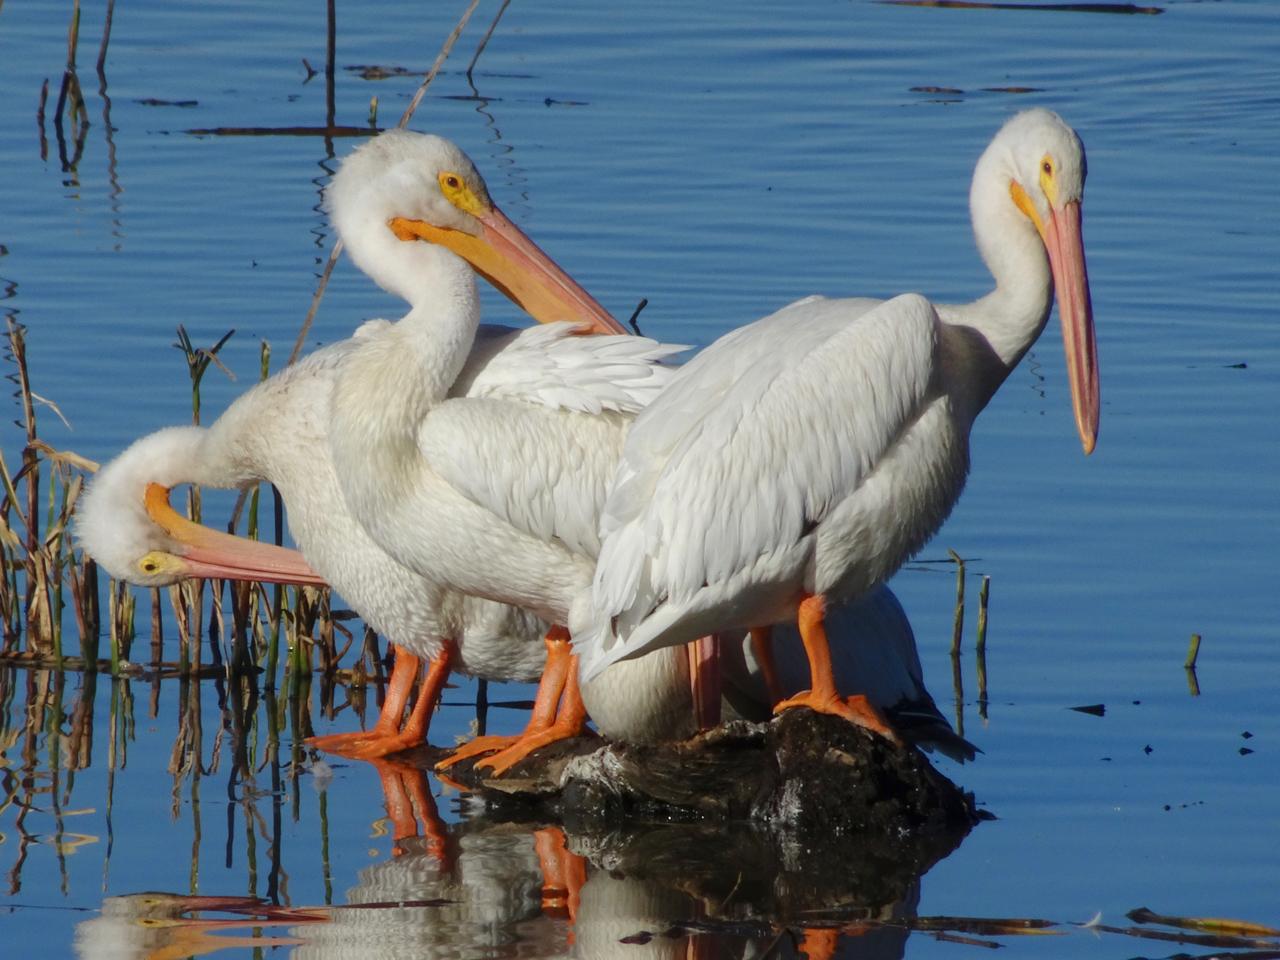 Squaw_Creek_Pelicans.jpg